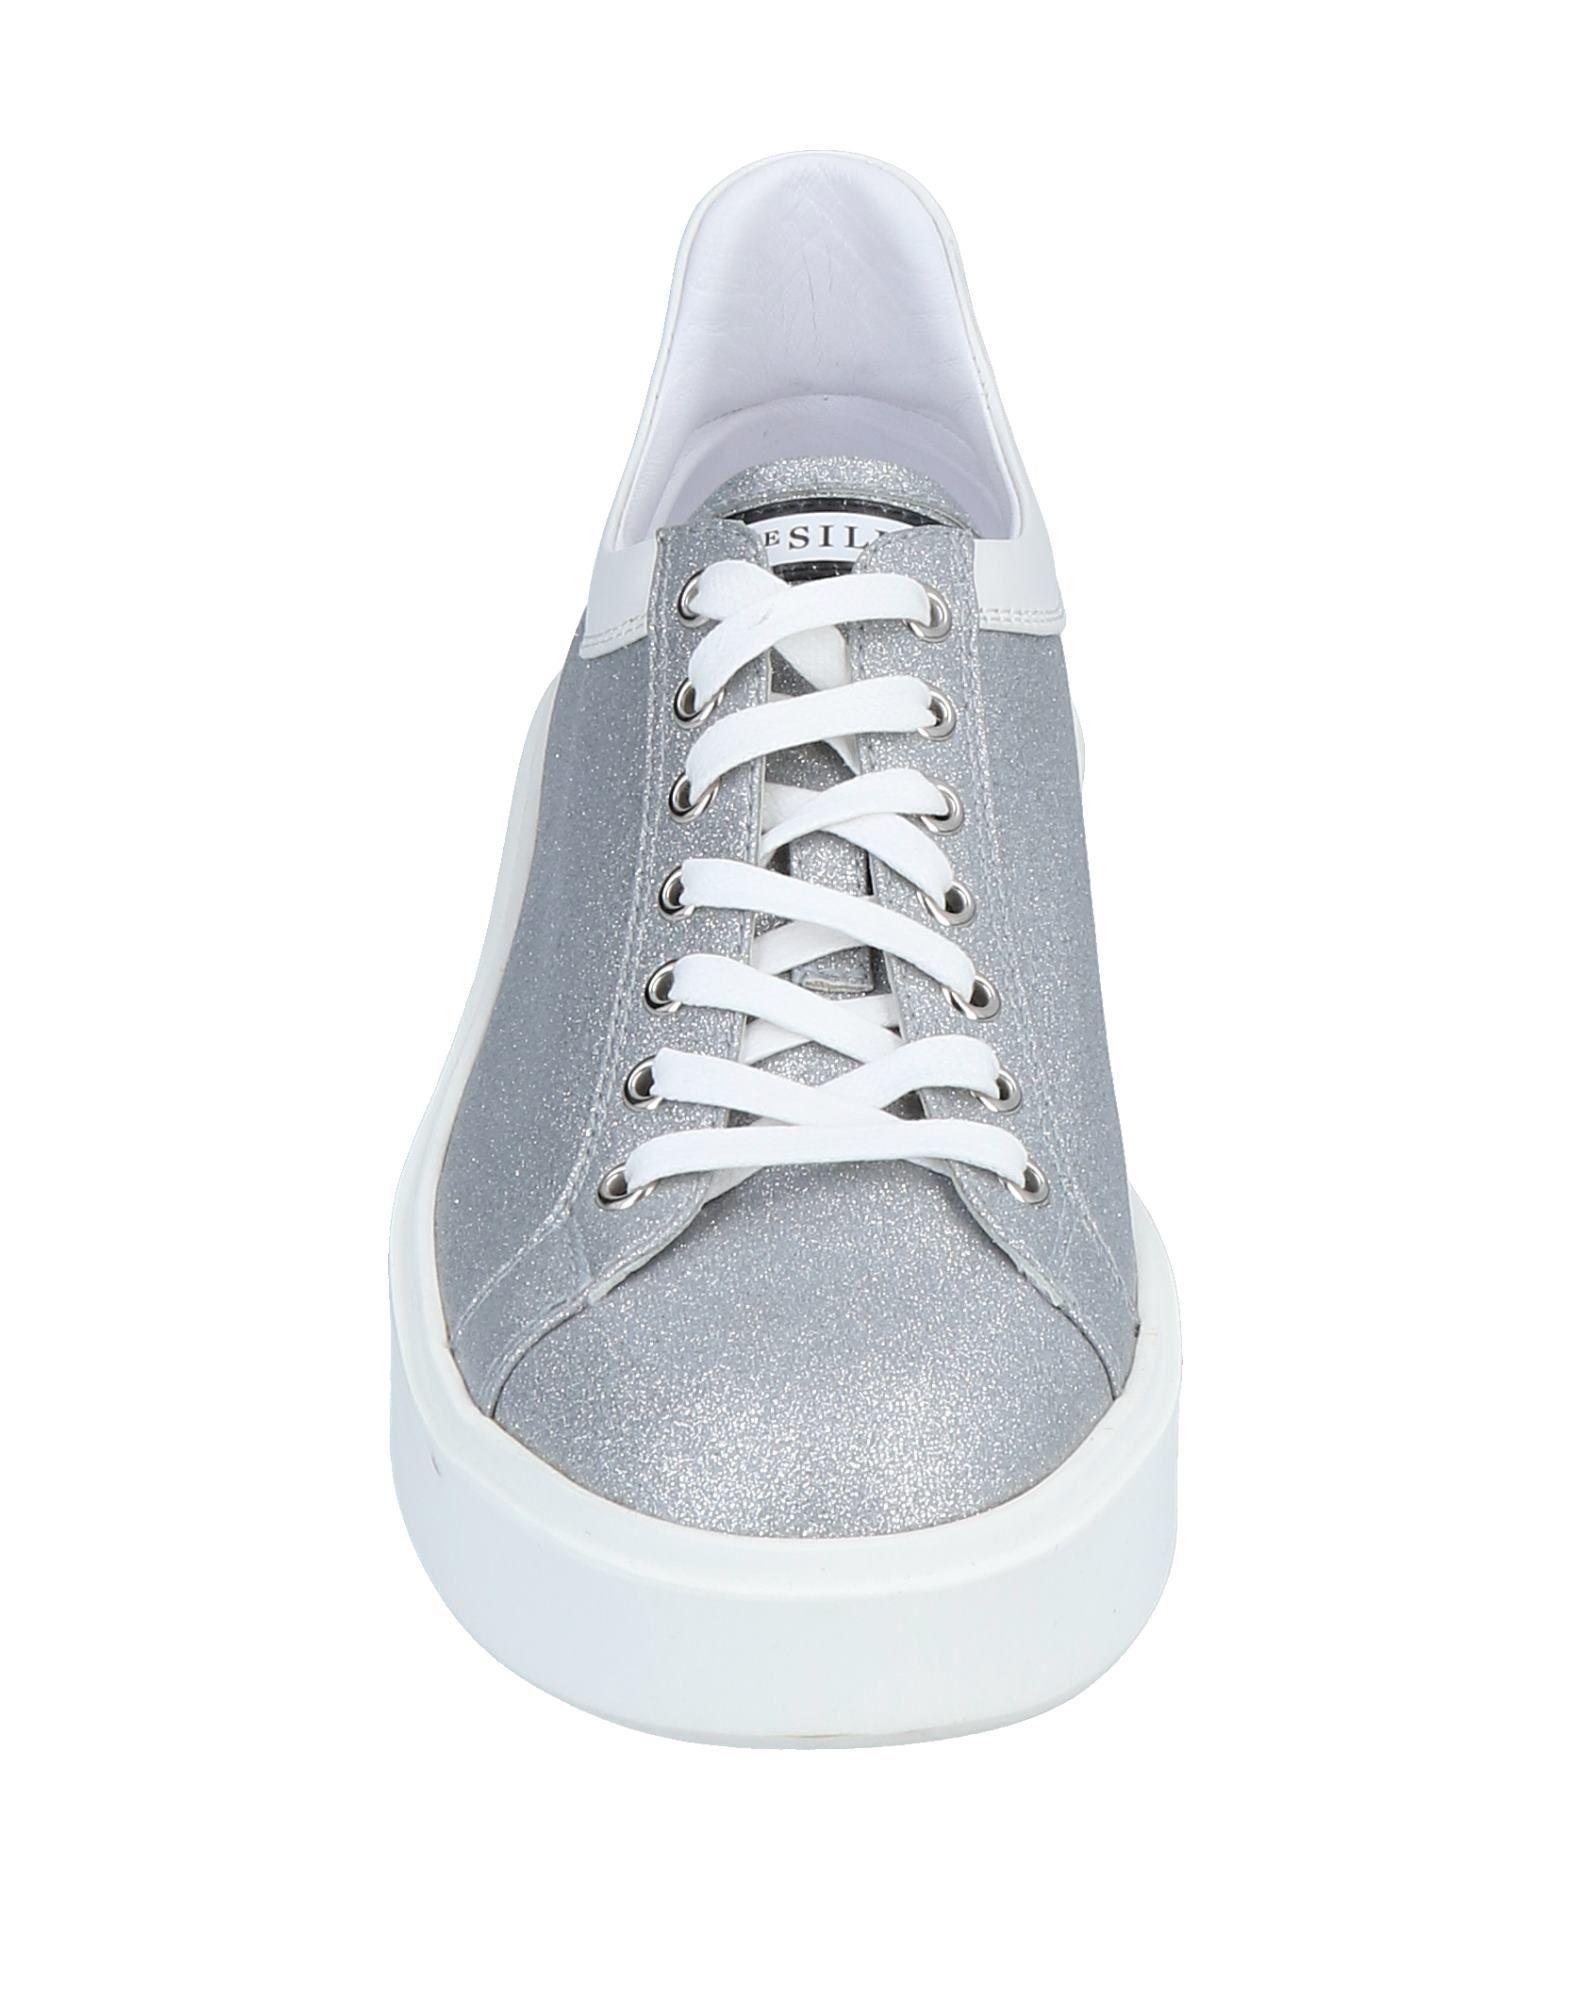 Le Silla Sneakers - Women Le Silla Silla Silla Sneakers online on  United Kingdom - 11569486LB 058aca